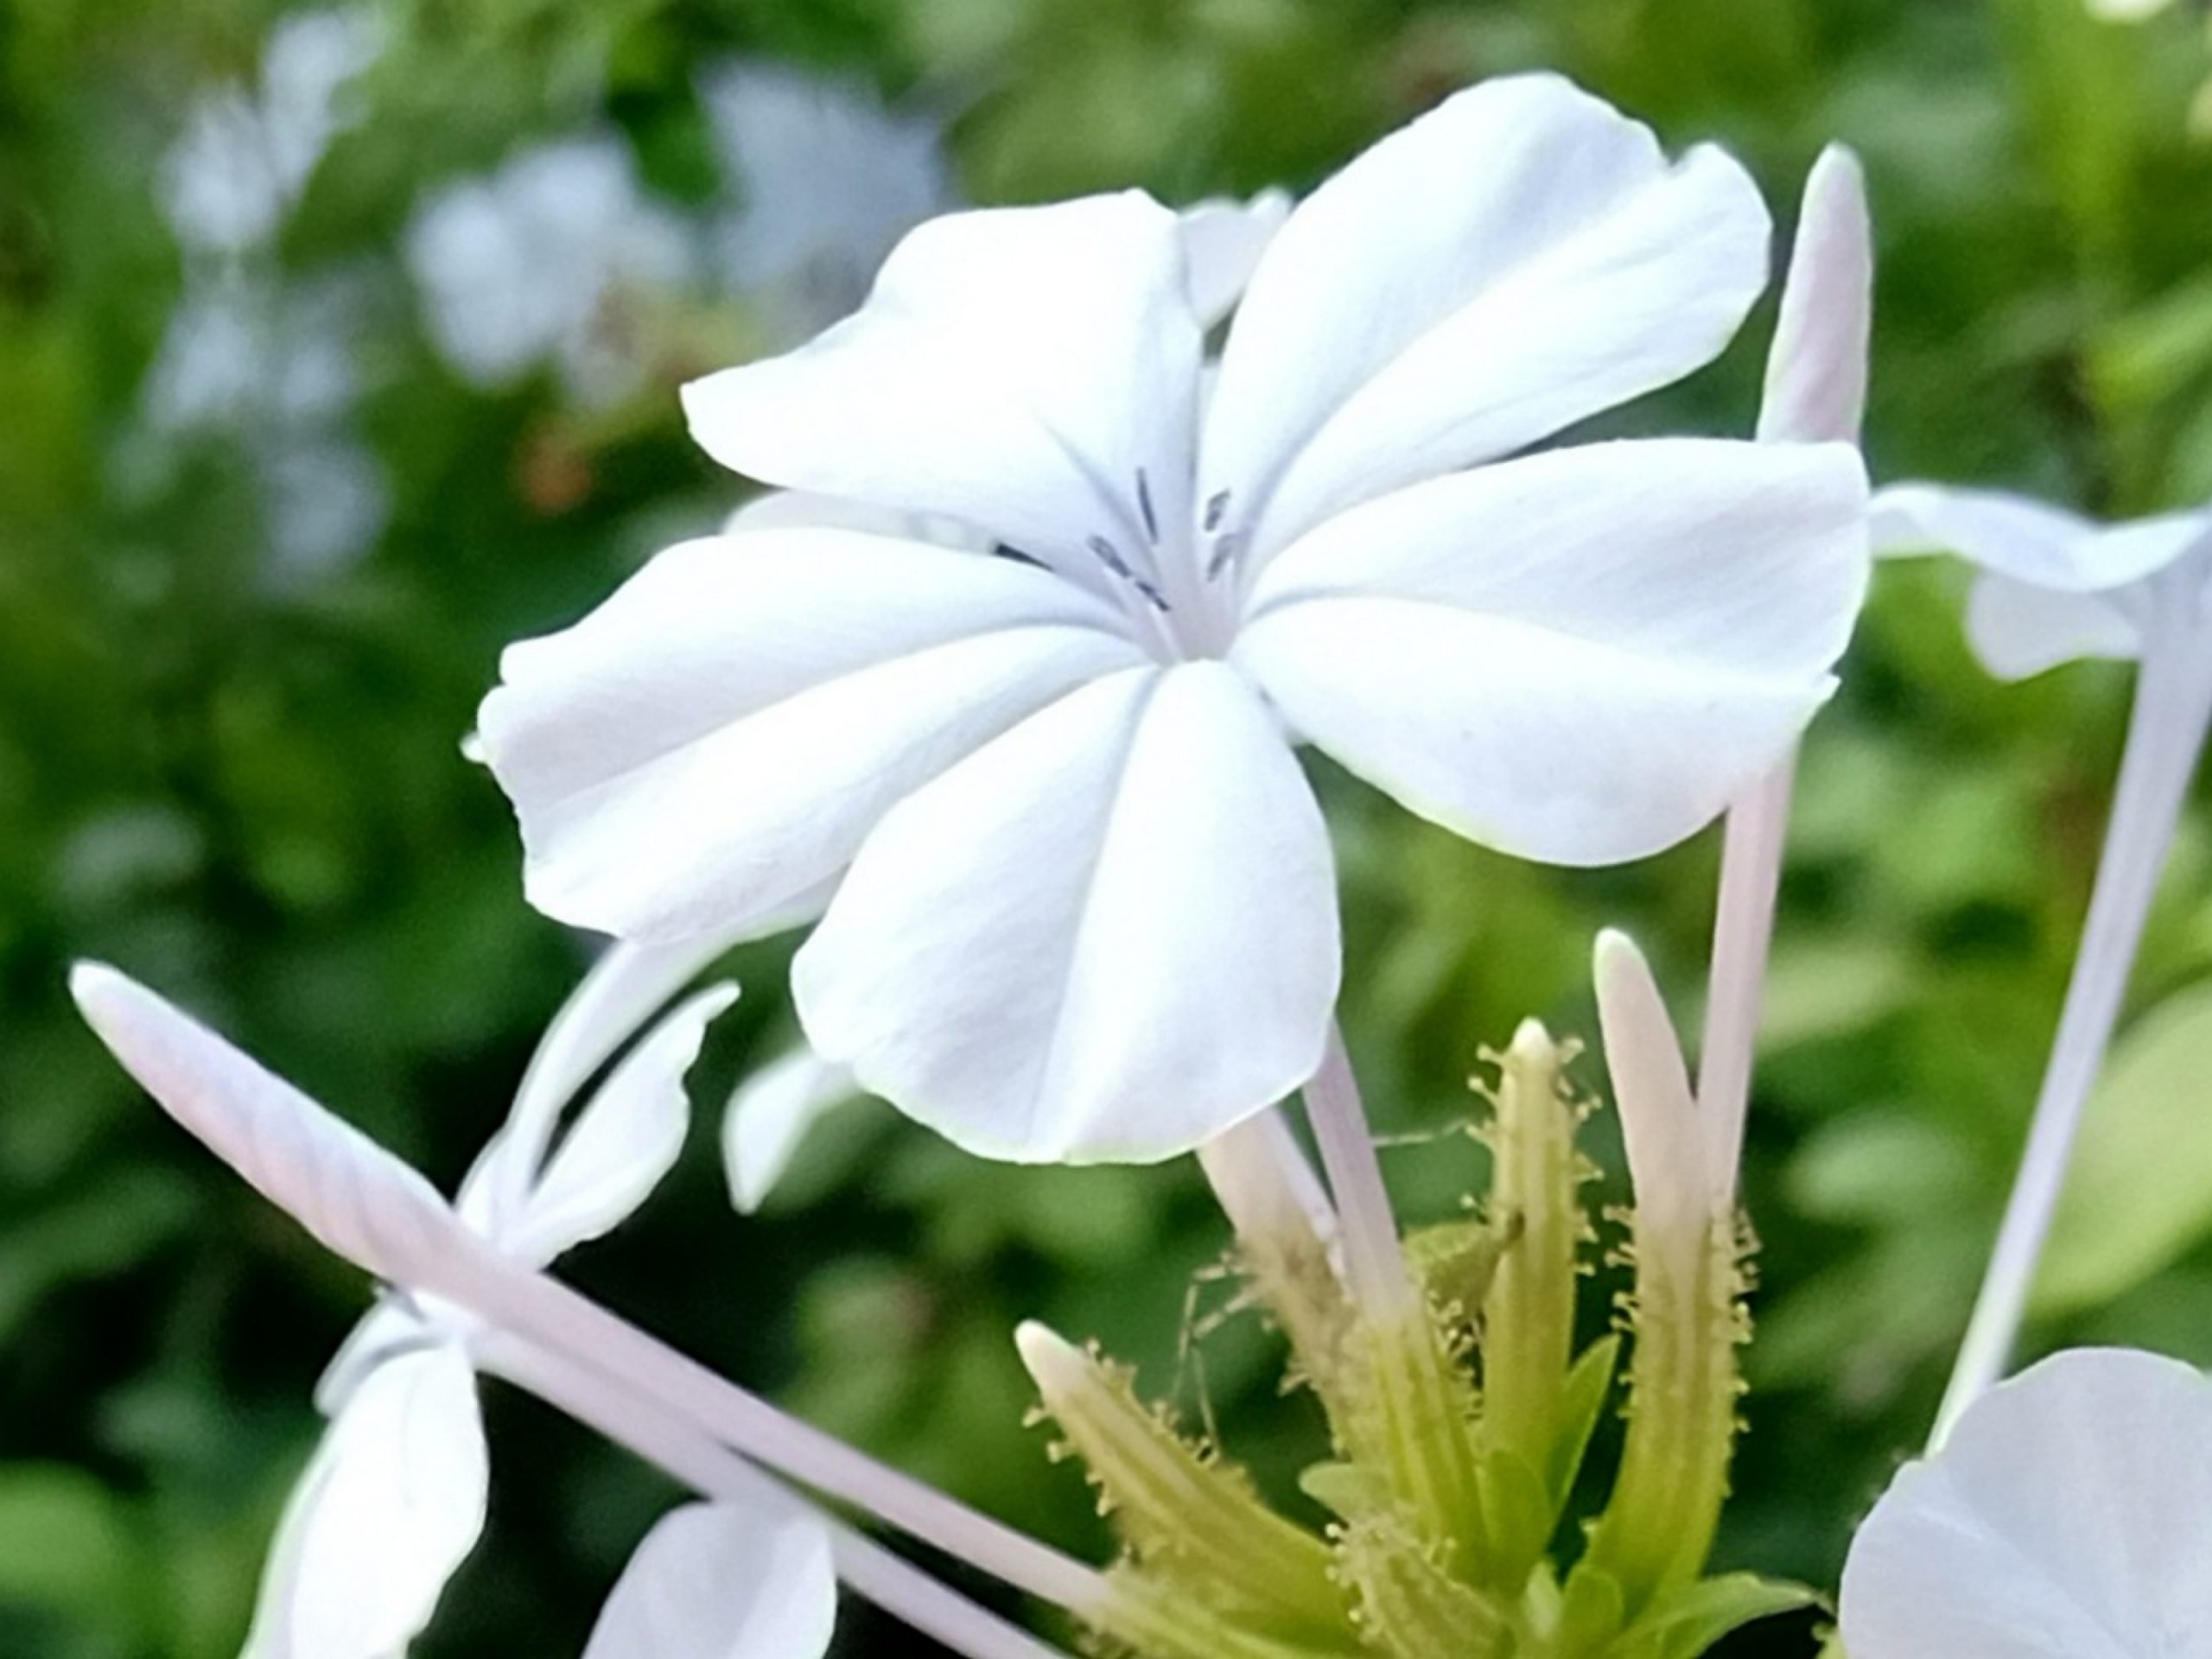 Blooming White Flower